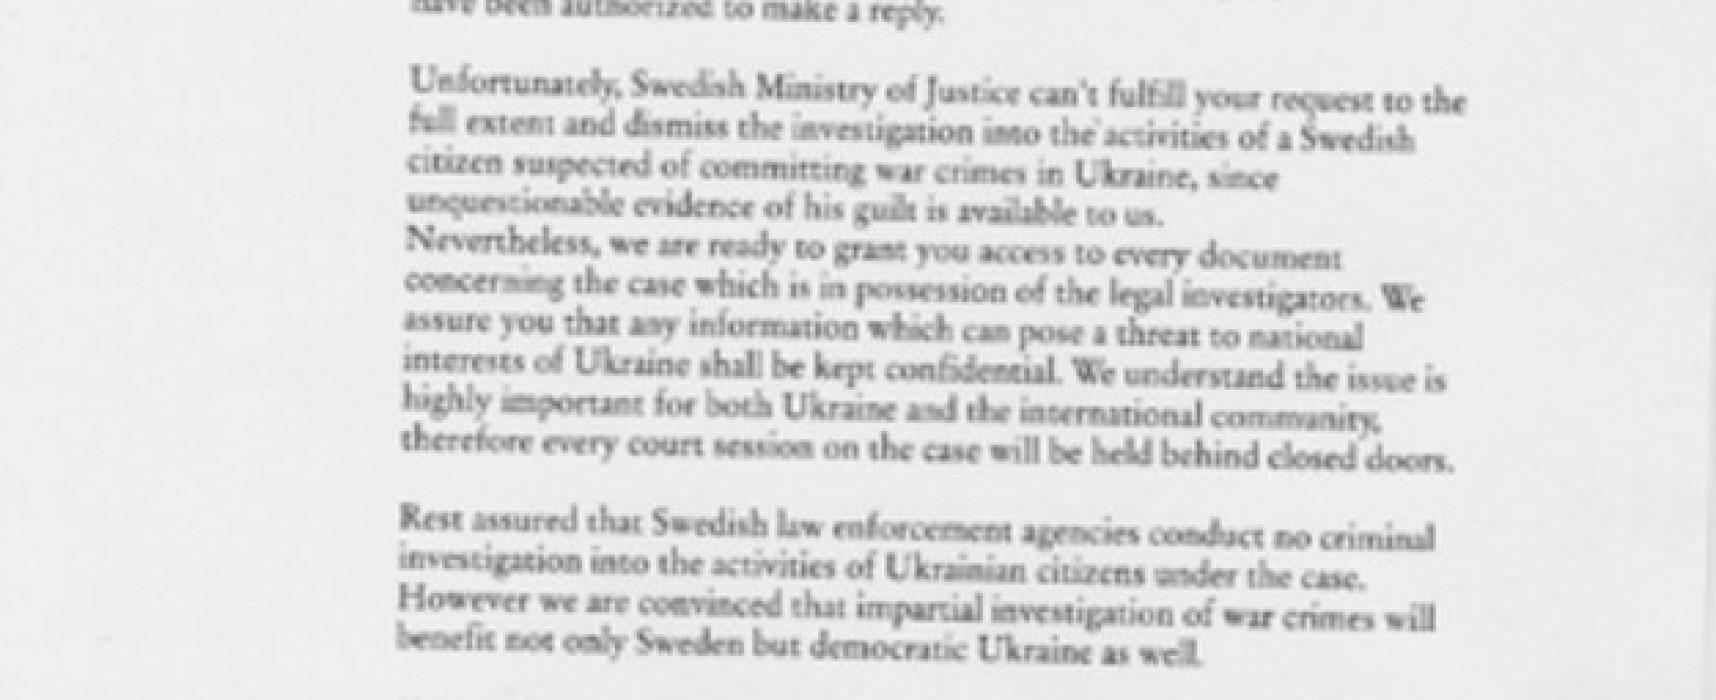 Fake Swedish letter in Russian media